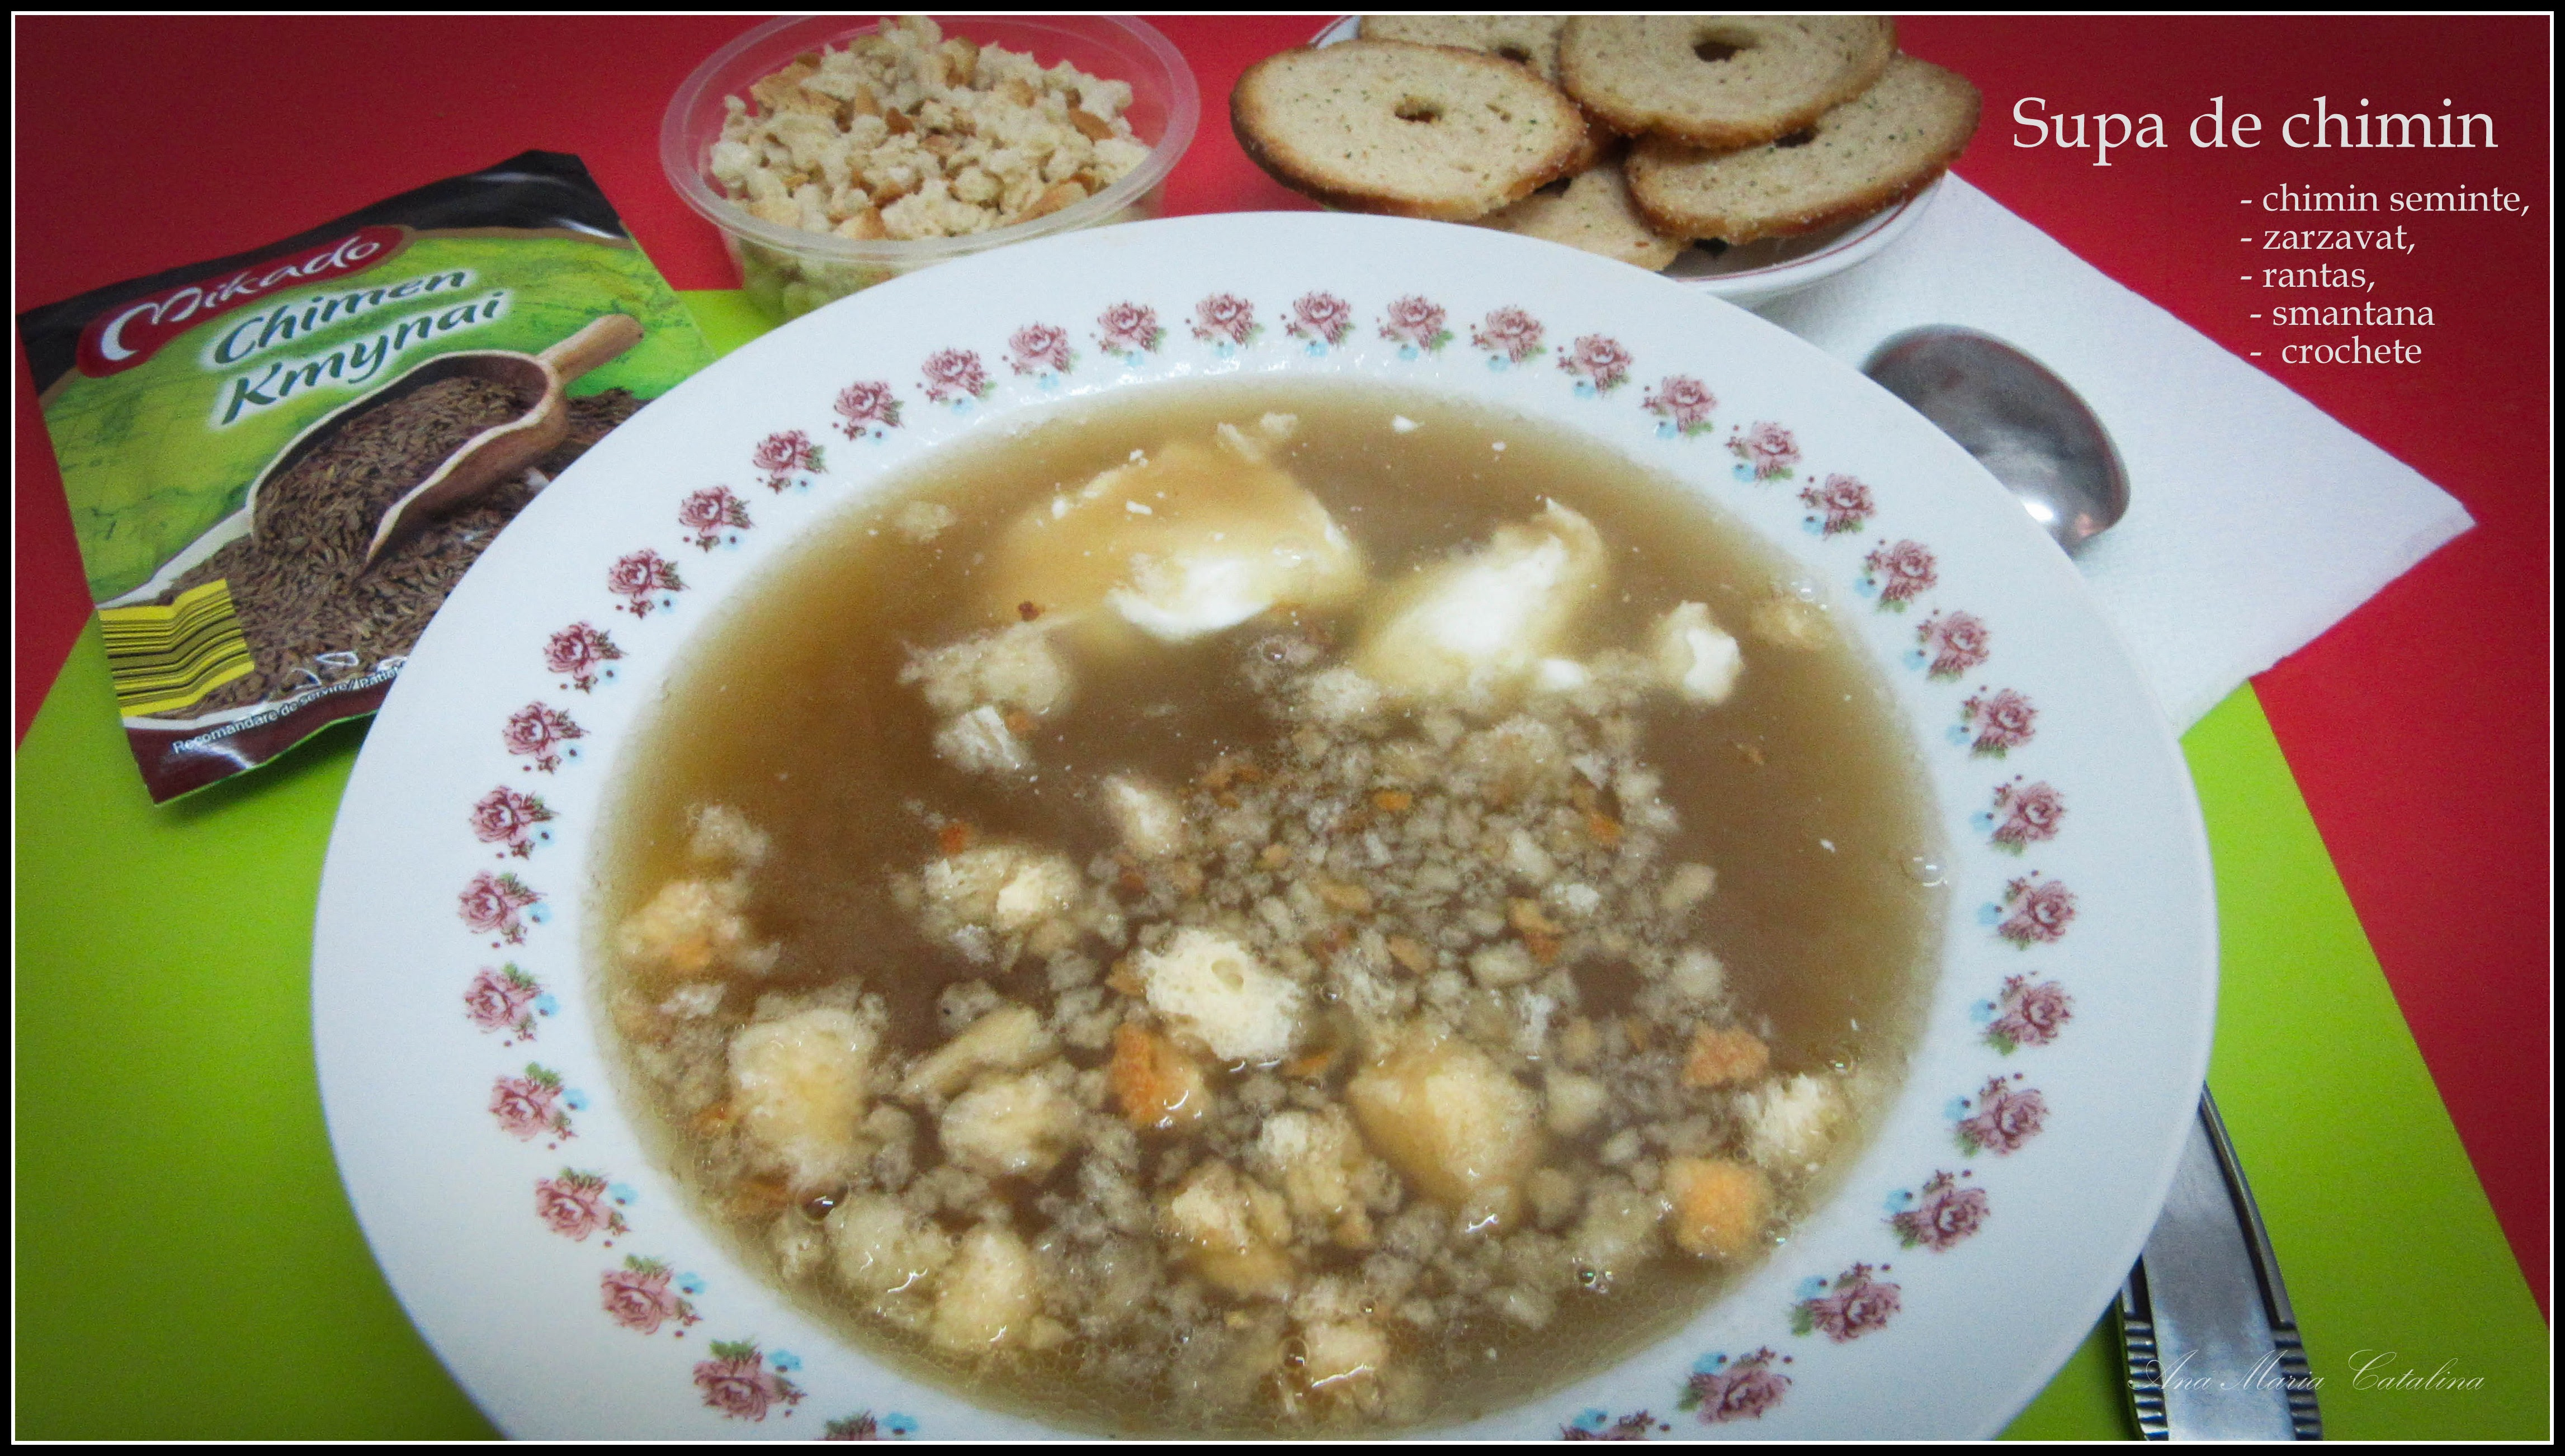 Photo: Supa de chimin - chimin seminte, zarzavaturi, rantas, smantana, crochete  - 2017.05.09